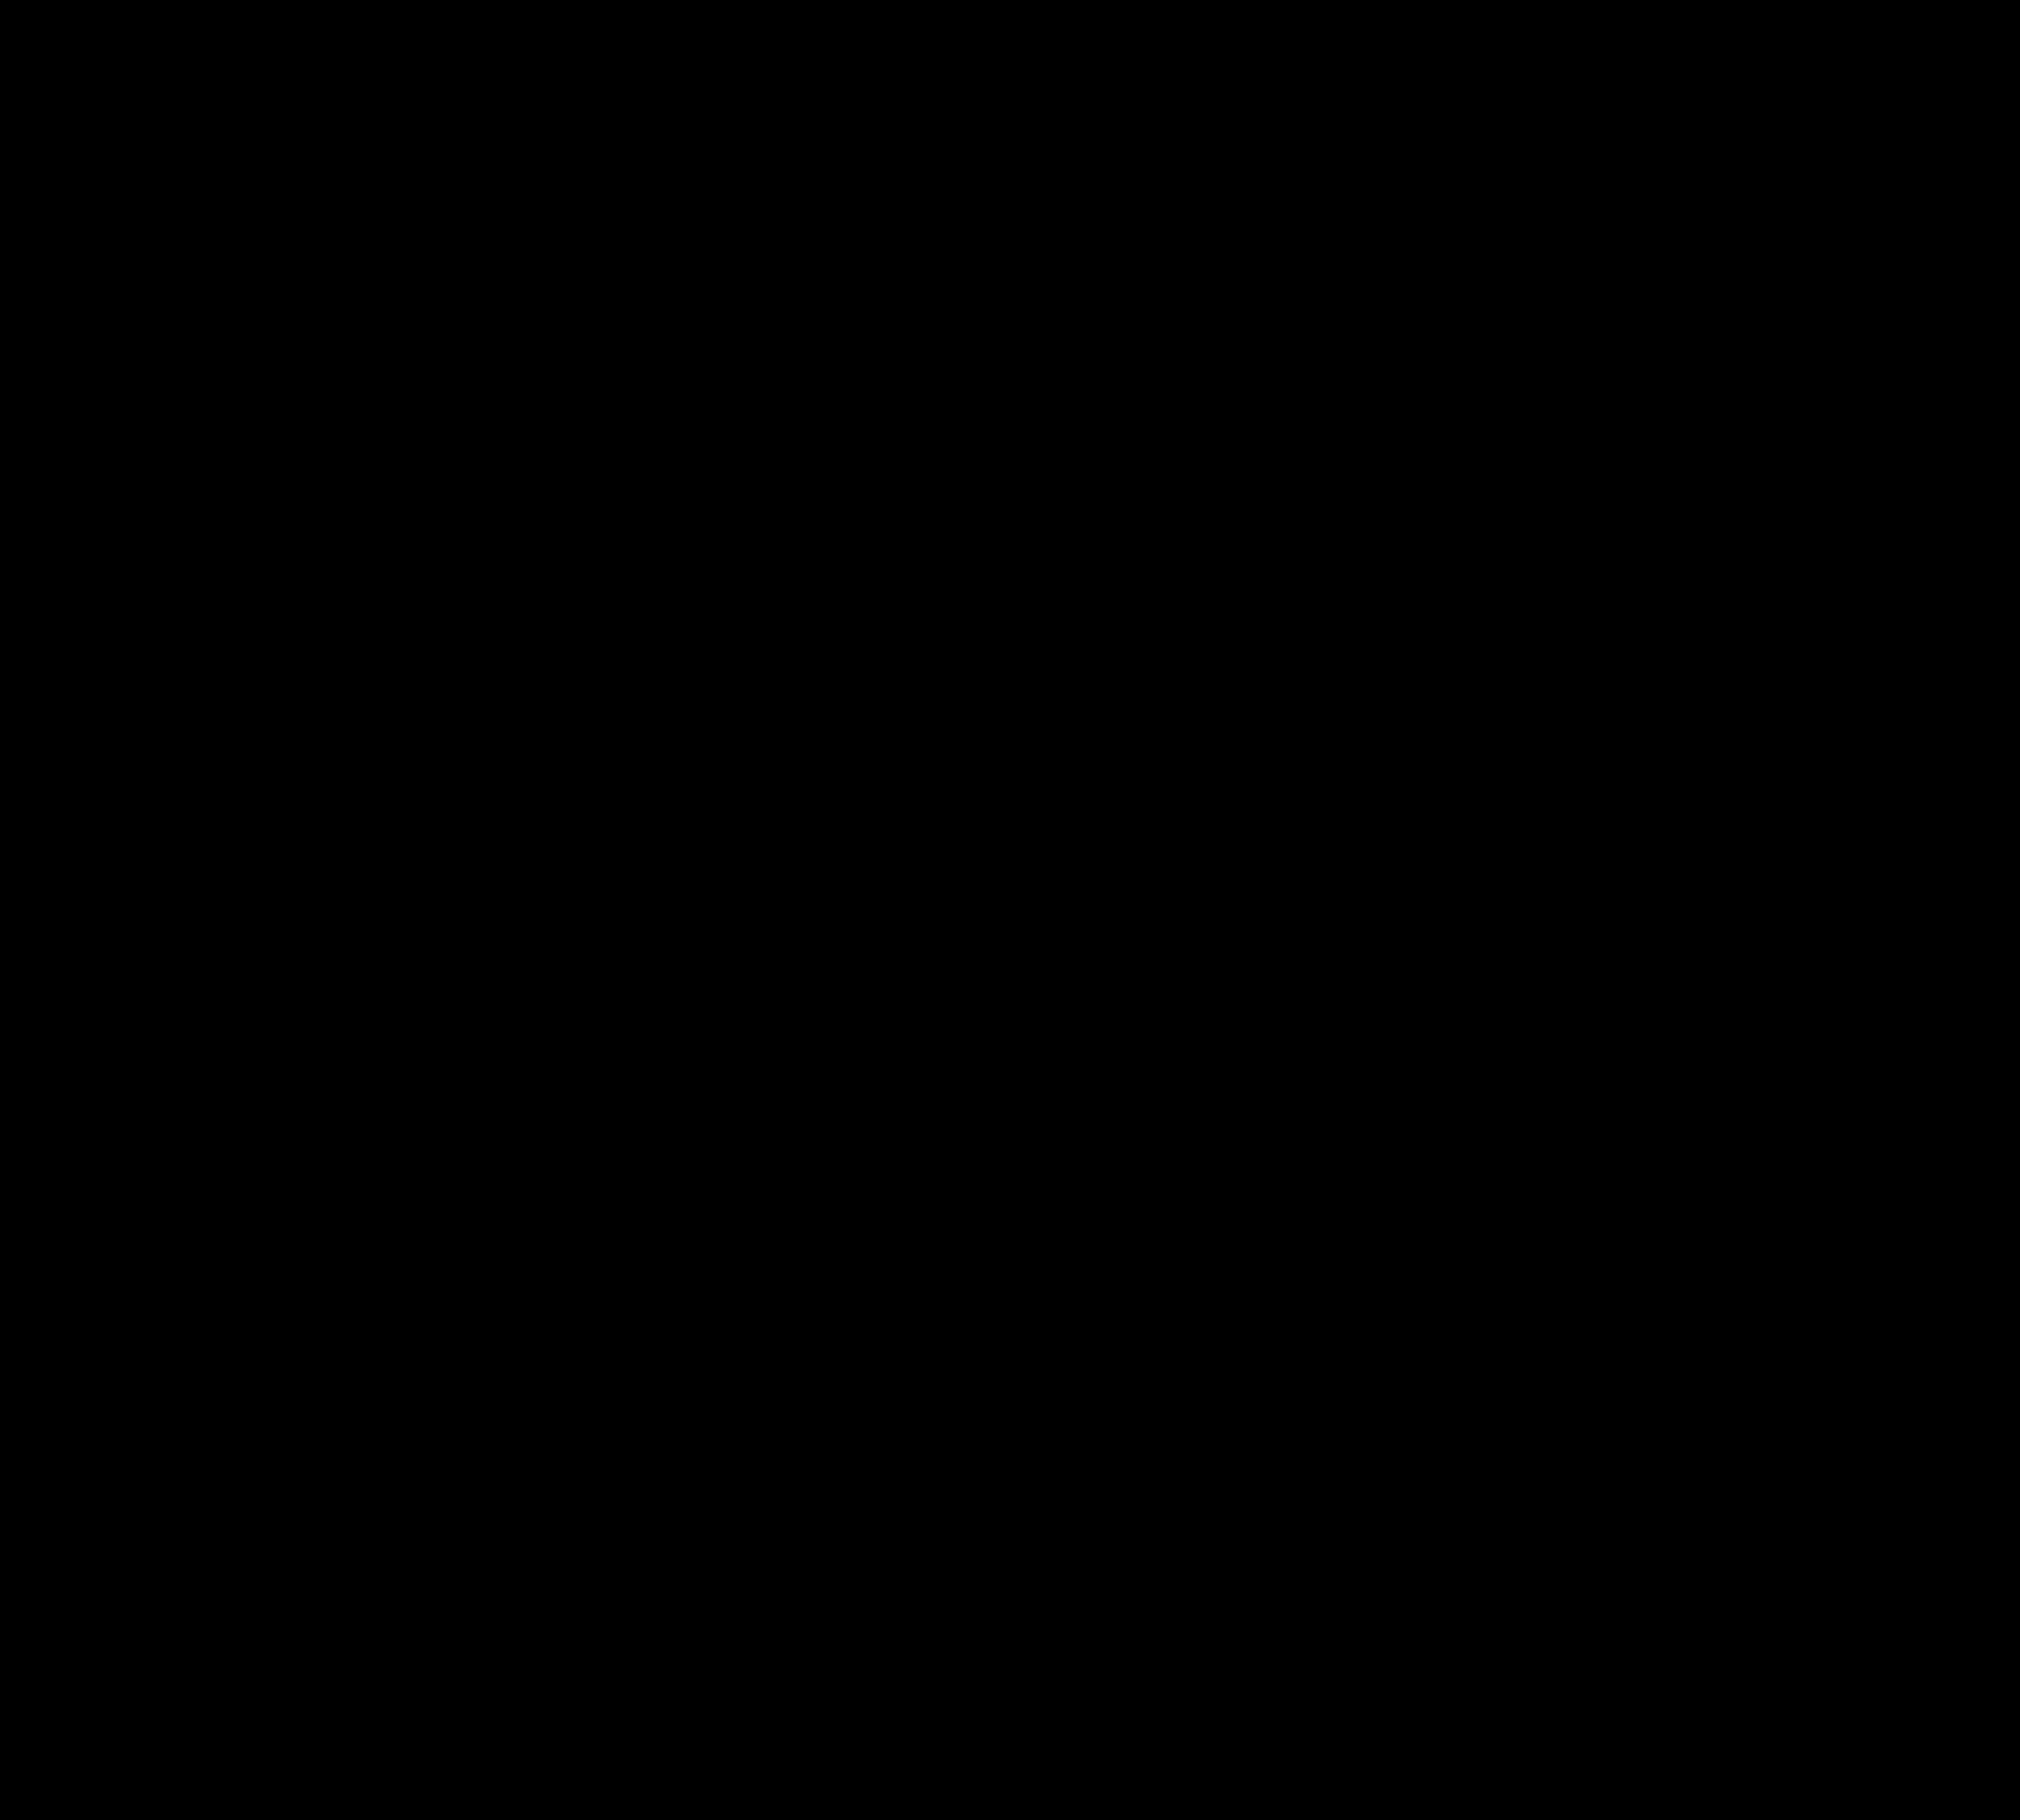 2400x2162 Clipart